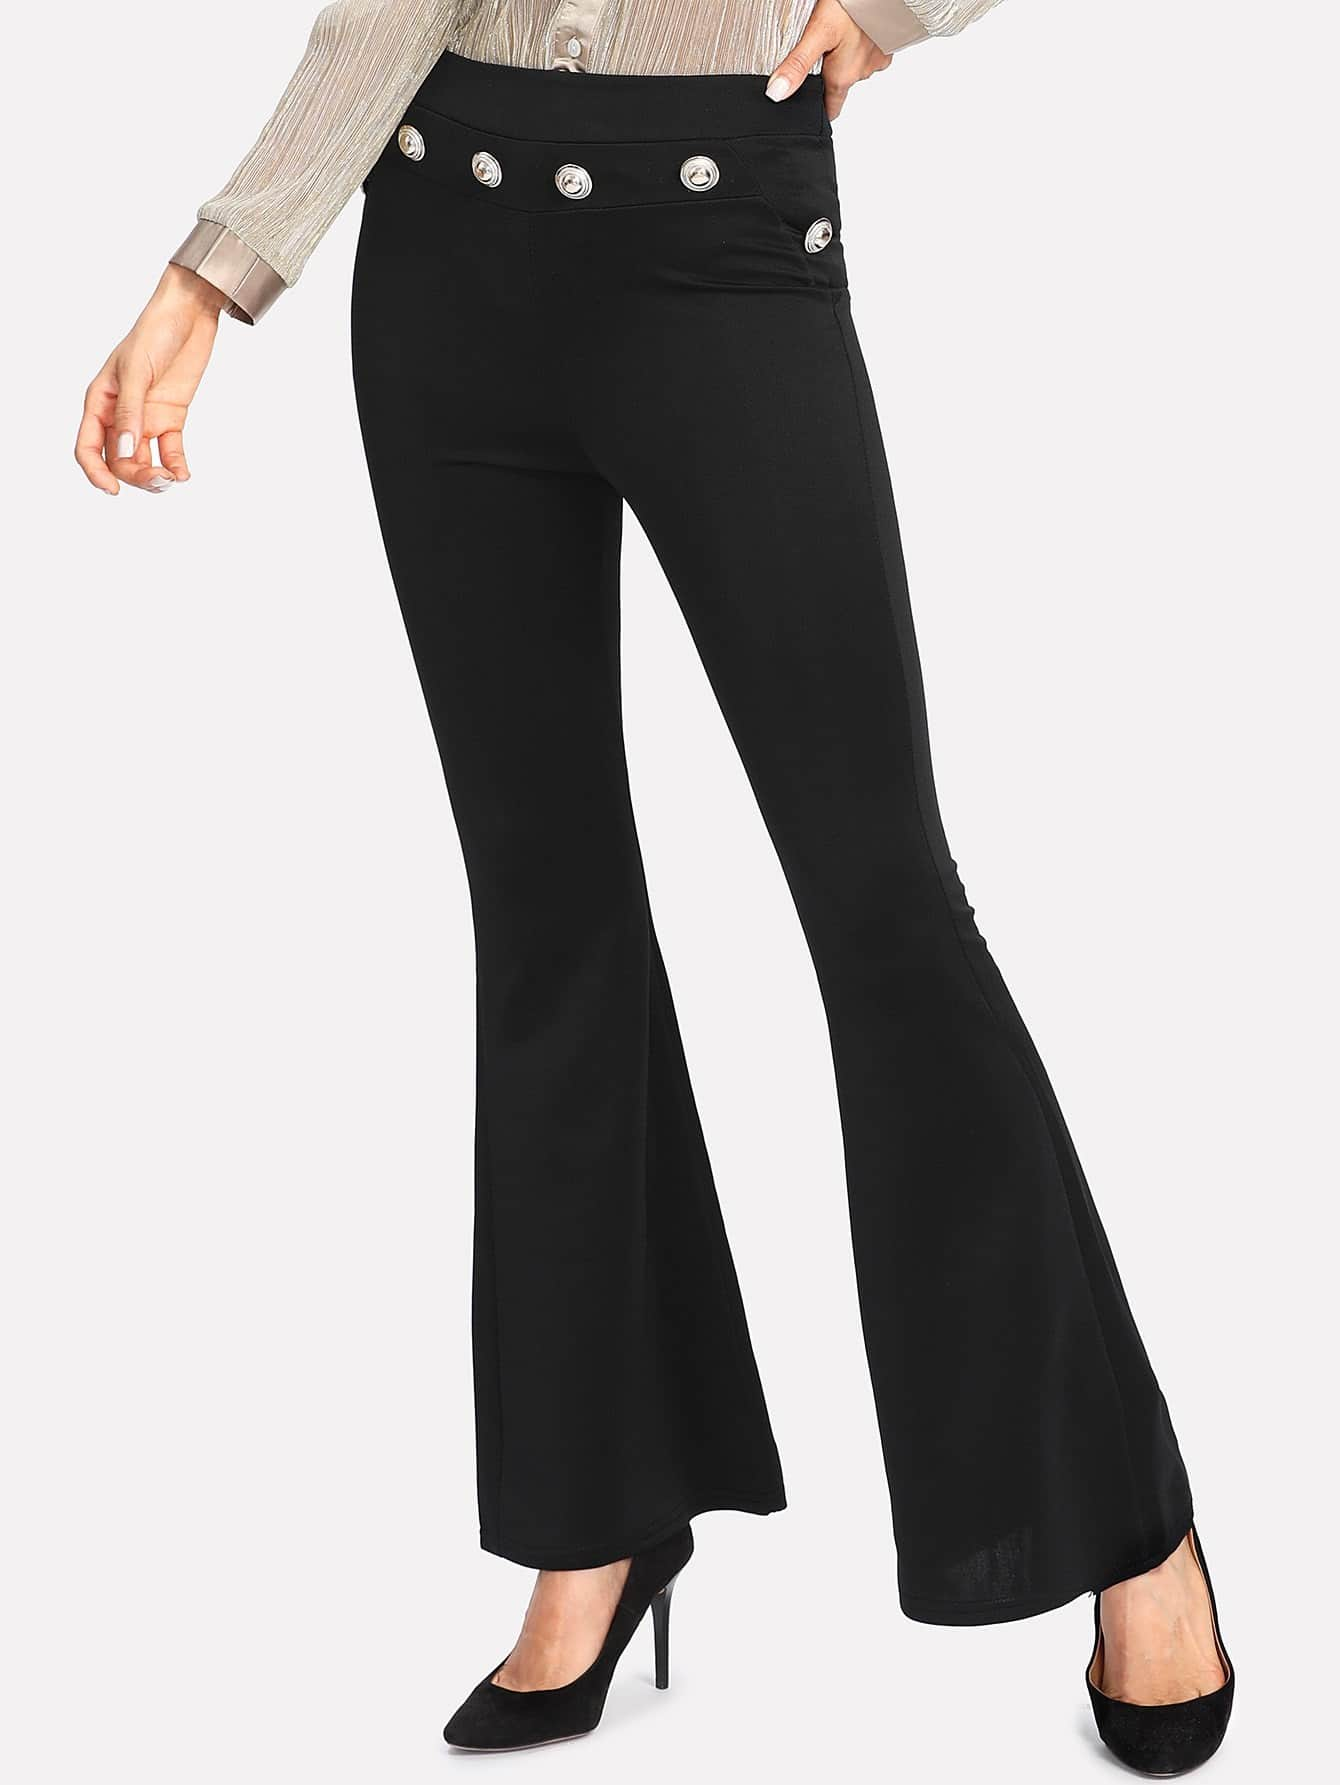 Image of Zip Back Flare Pants